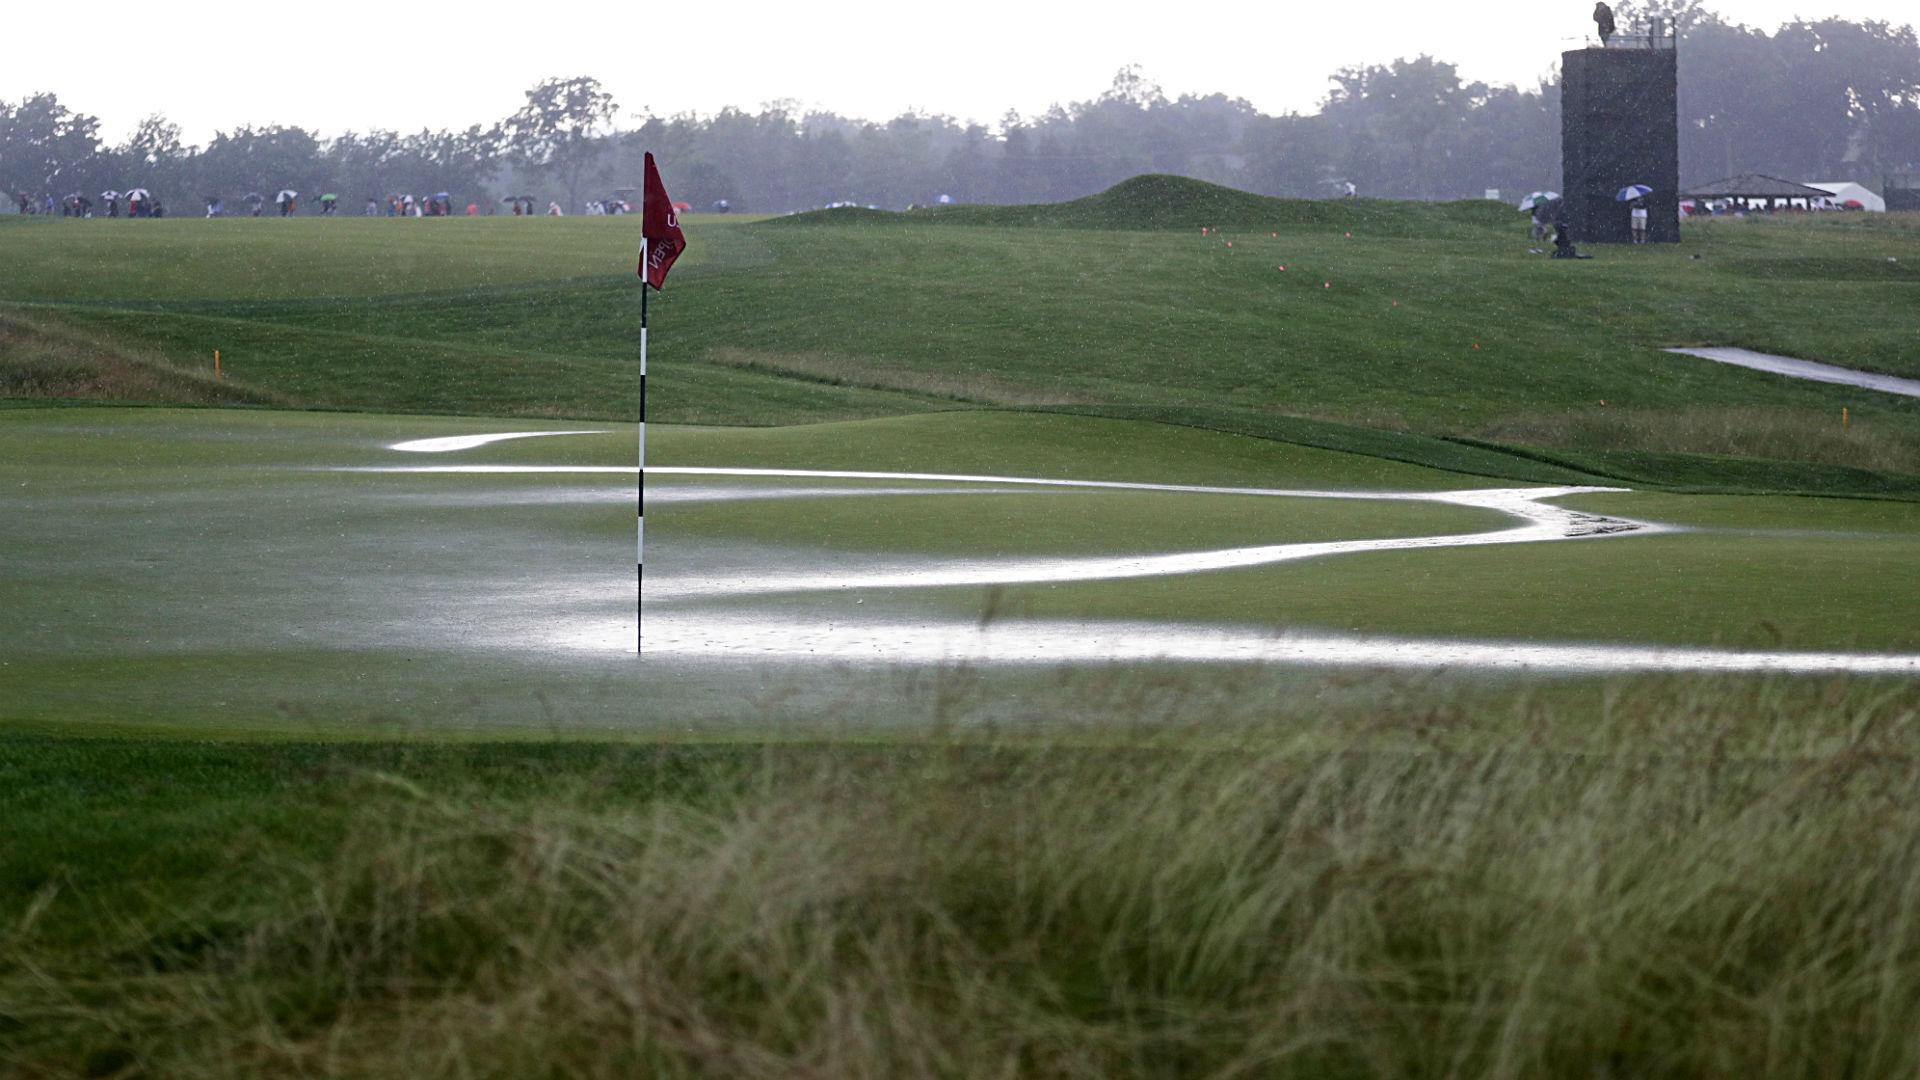 u s  open golf 2016  schedule  pairings  tee times  tv for